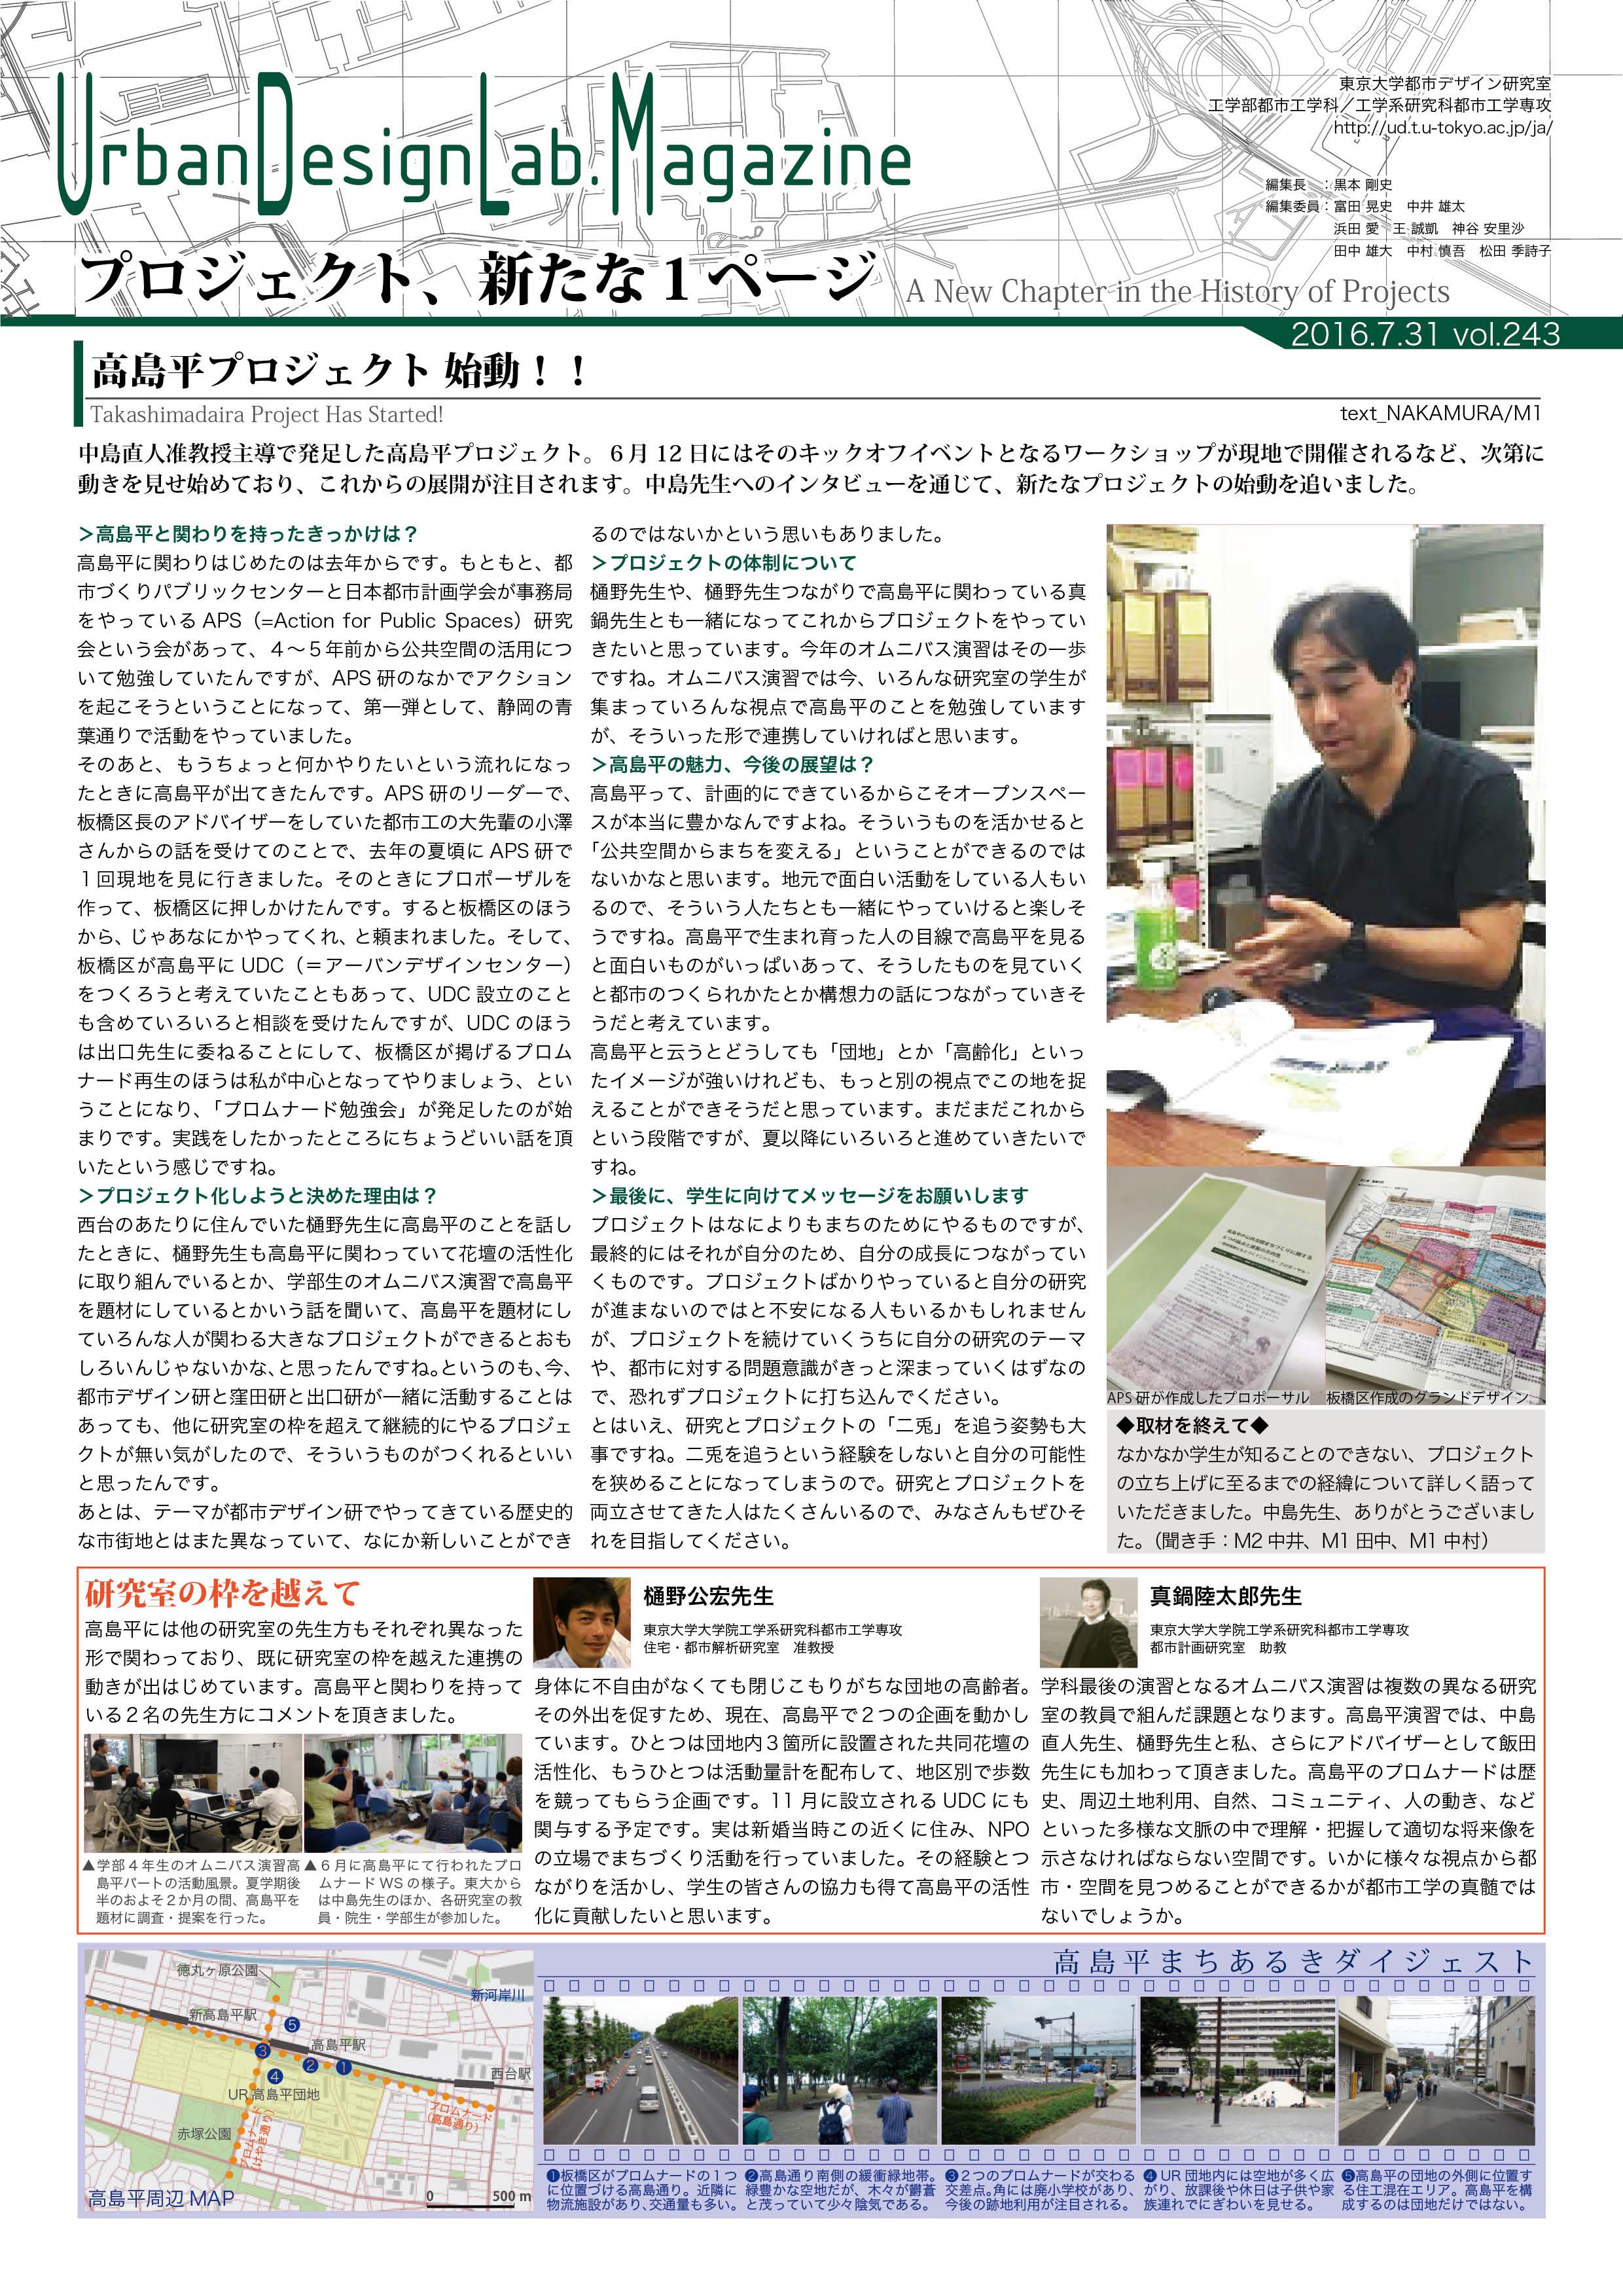 http://ud.t.u-tokyo.ac.jp/blog/_images/labmaga243-6%E8%A1%A8%E7%B4%99.jpg